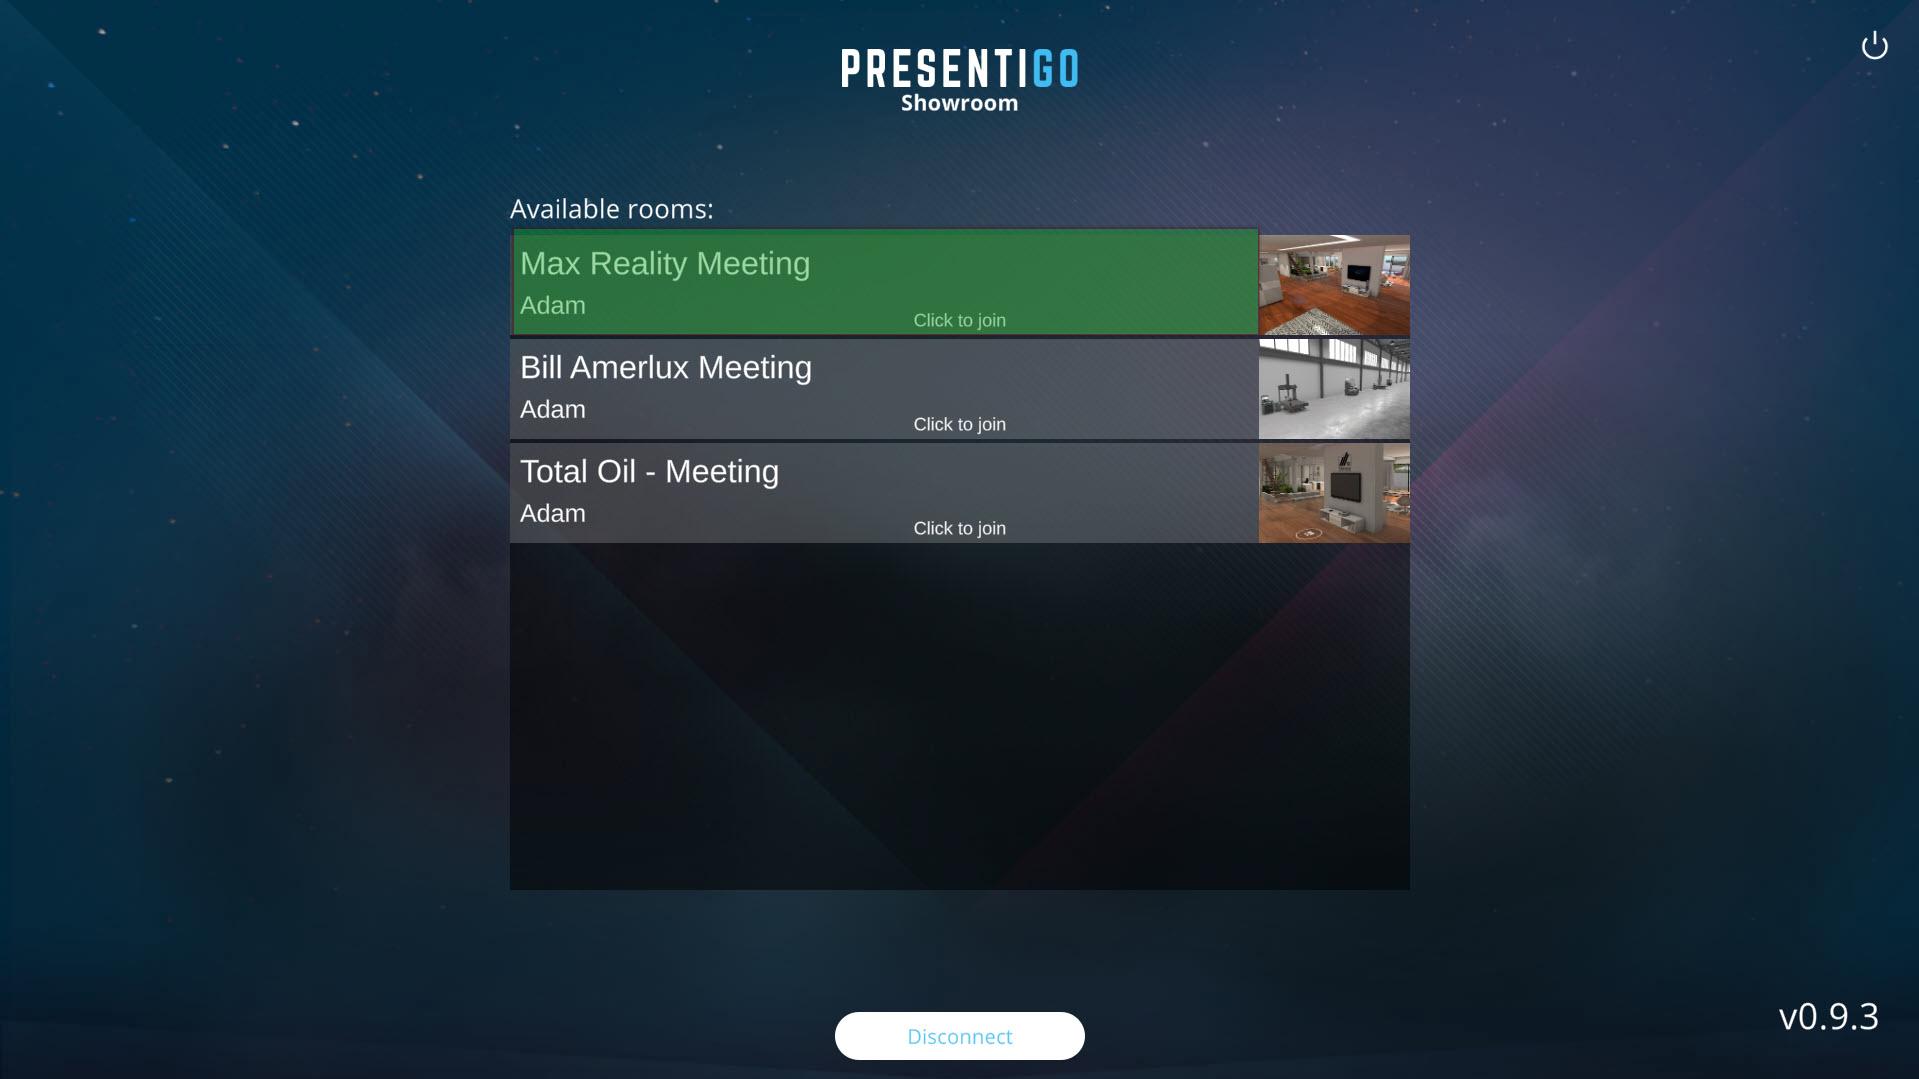 VR SHOWROOM MEETINGS MANAGEMENT